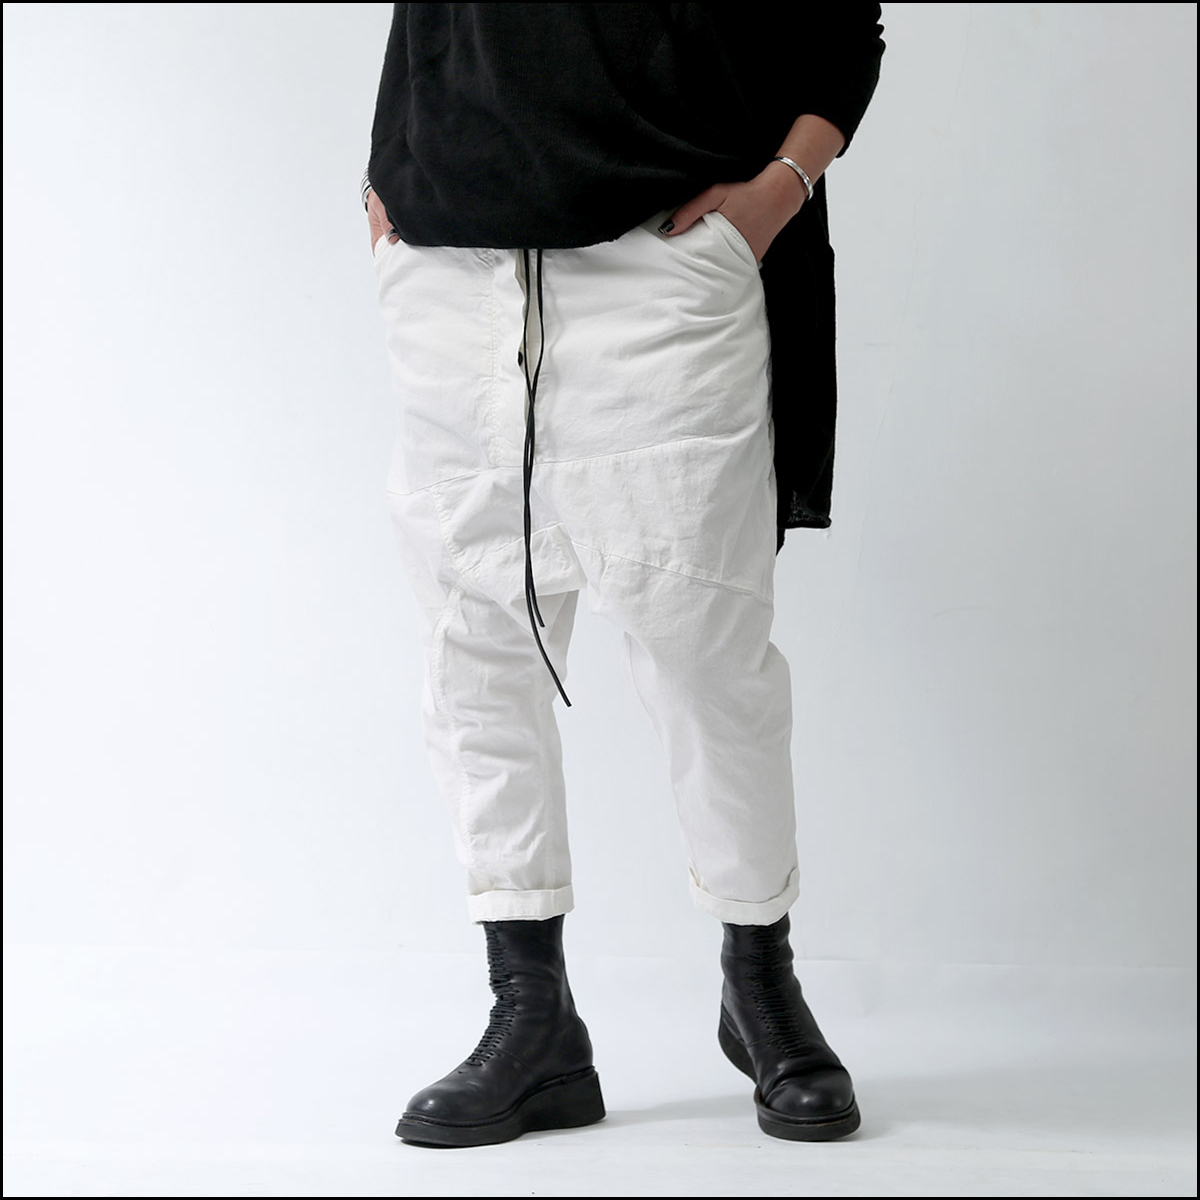 RUNDHOLZ DIP_UNISEX SARROUEL PANTS 260 0108_CHALK(WHITE)